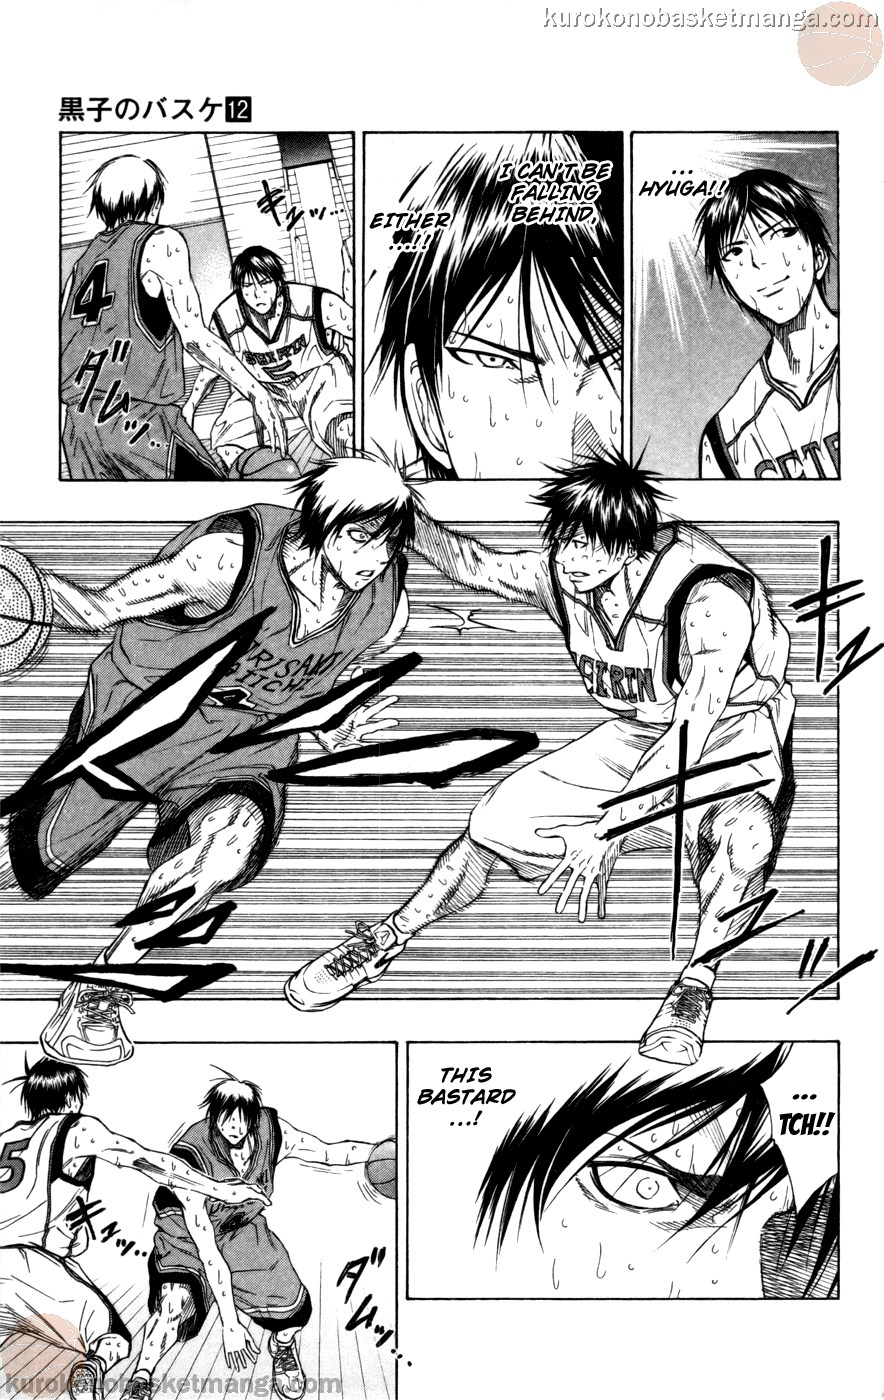 Kuroko no Basket Manga Chapter 106 - Image 09